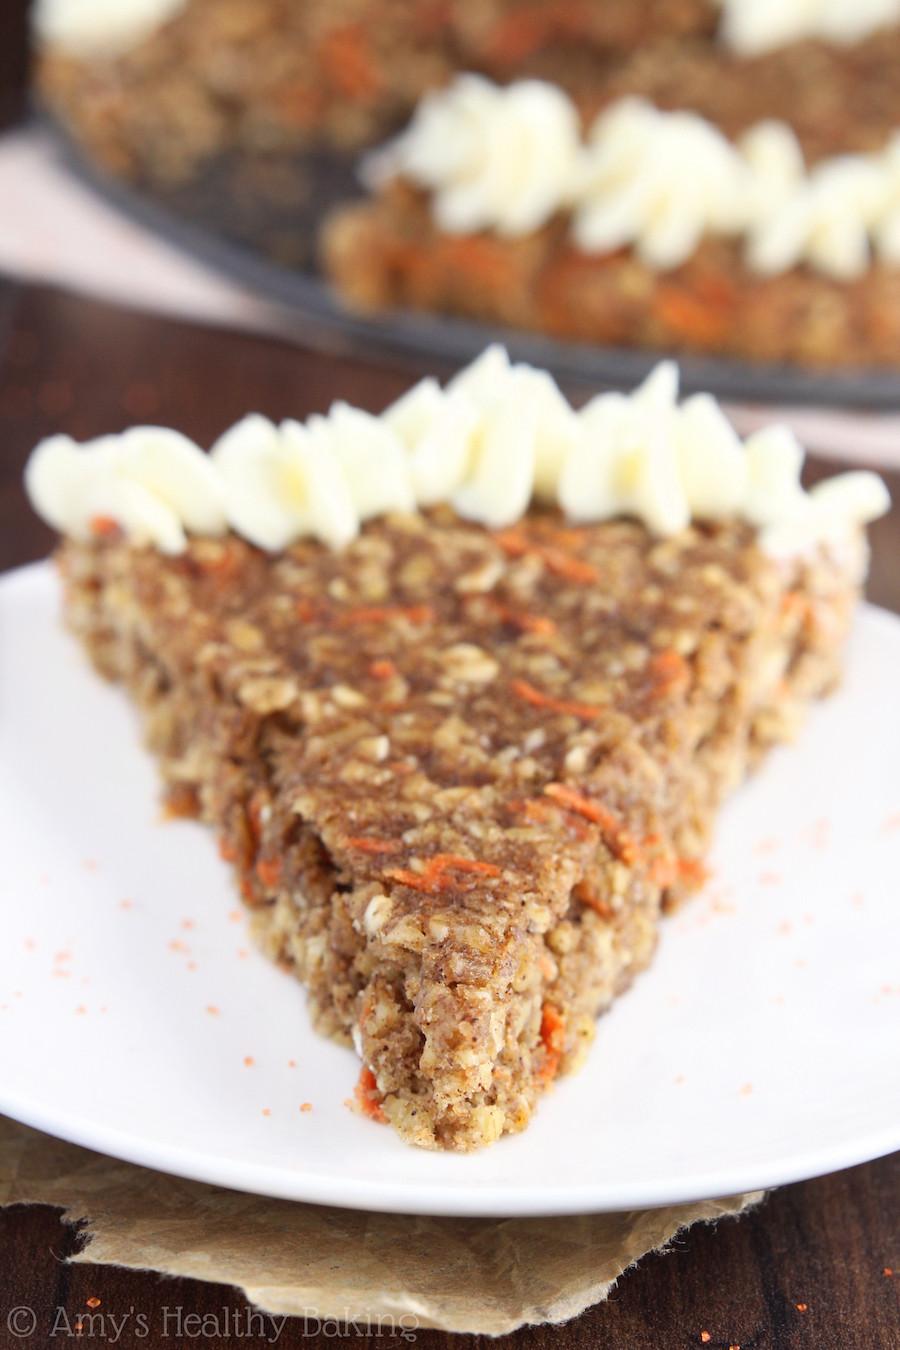 Oatmeal Dessert Recipes  Carrot Cake Oatmeal Cookie Cake